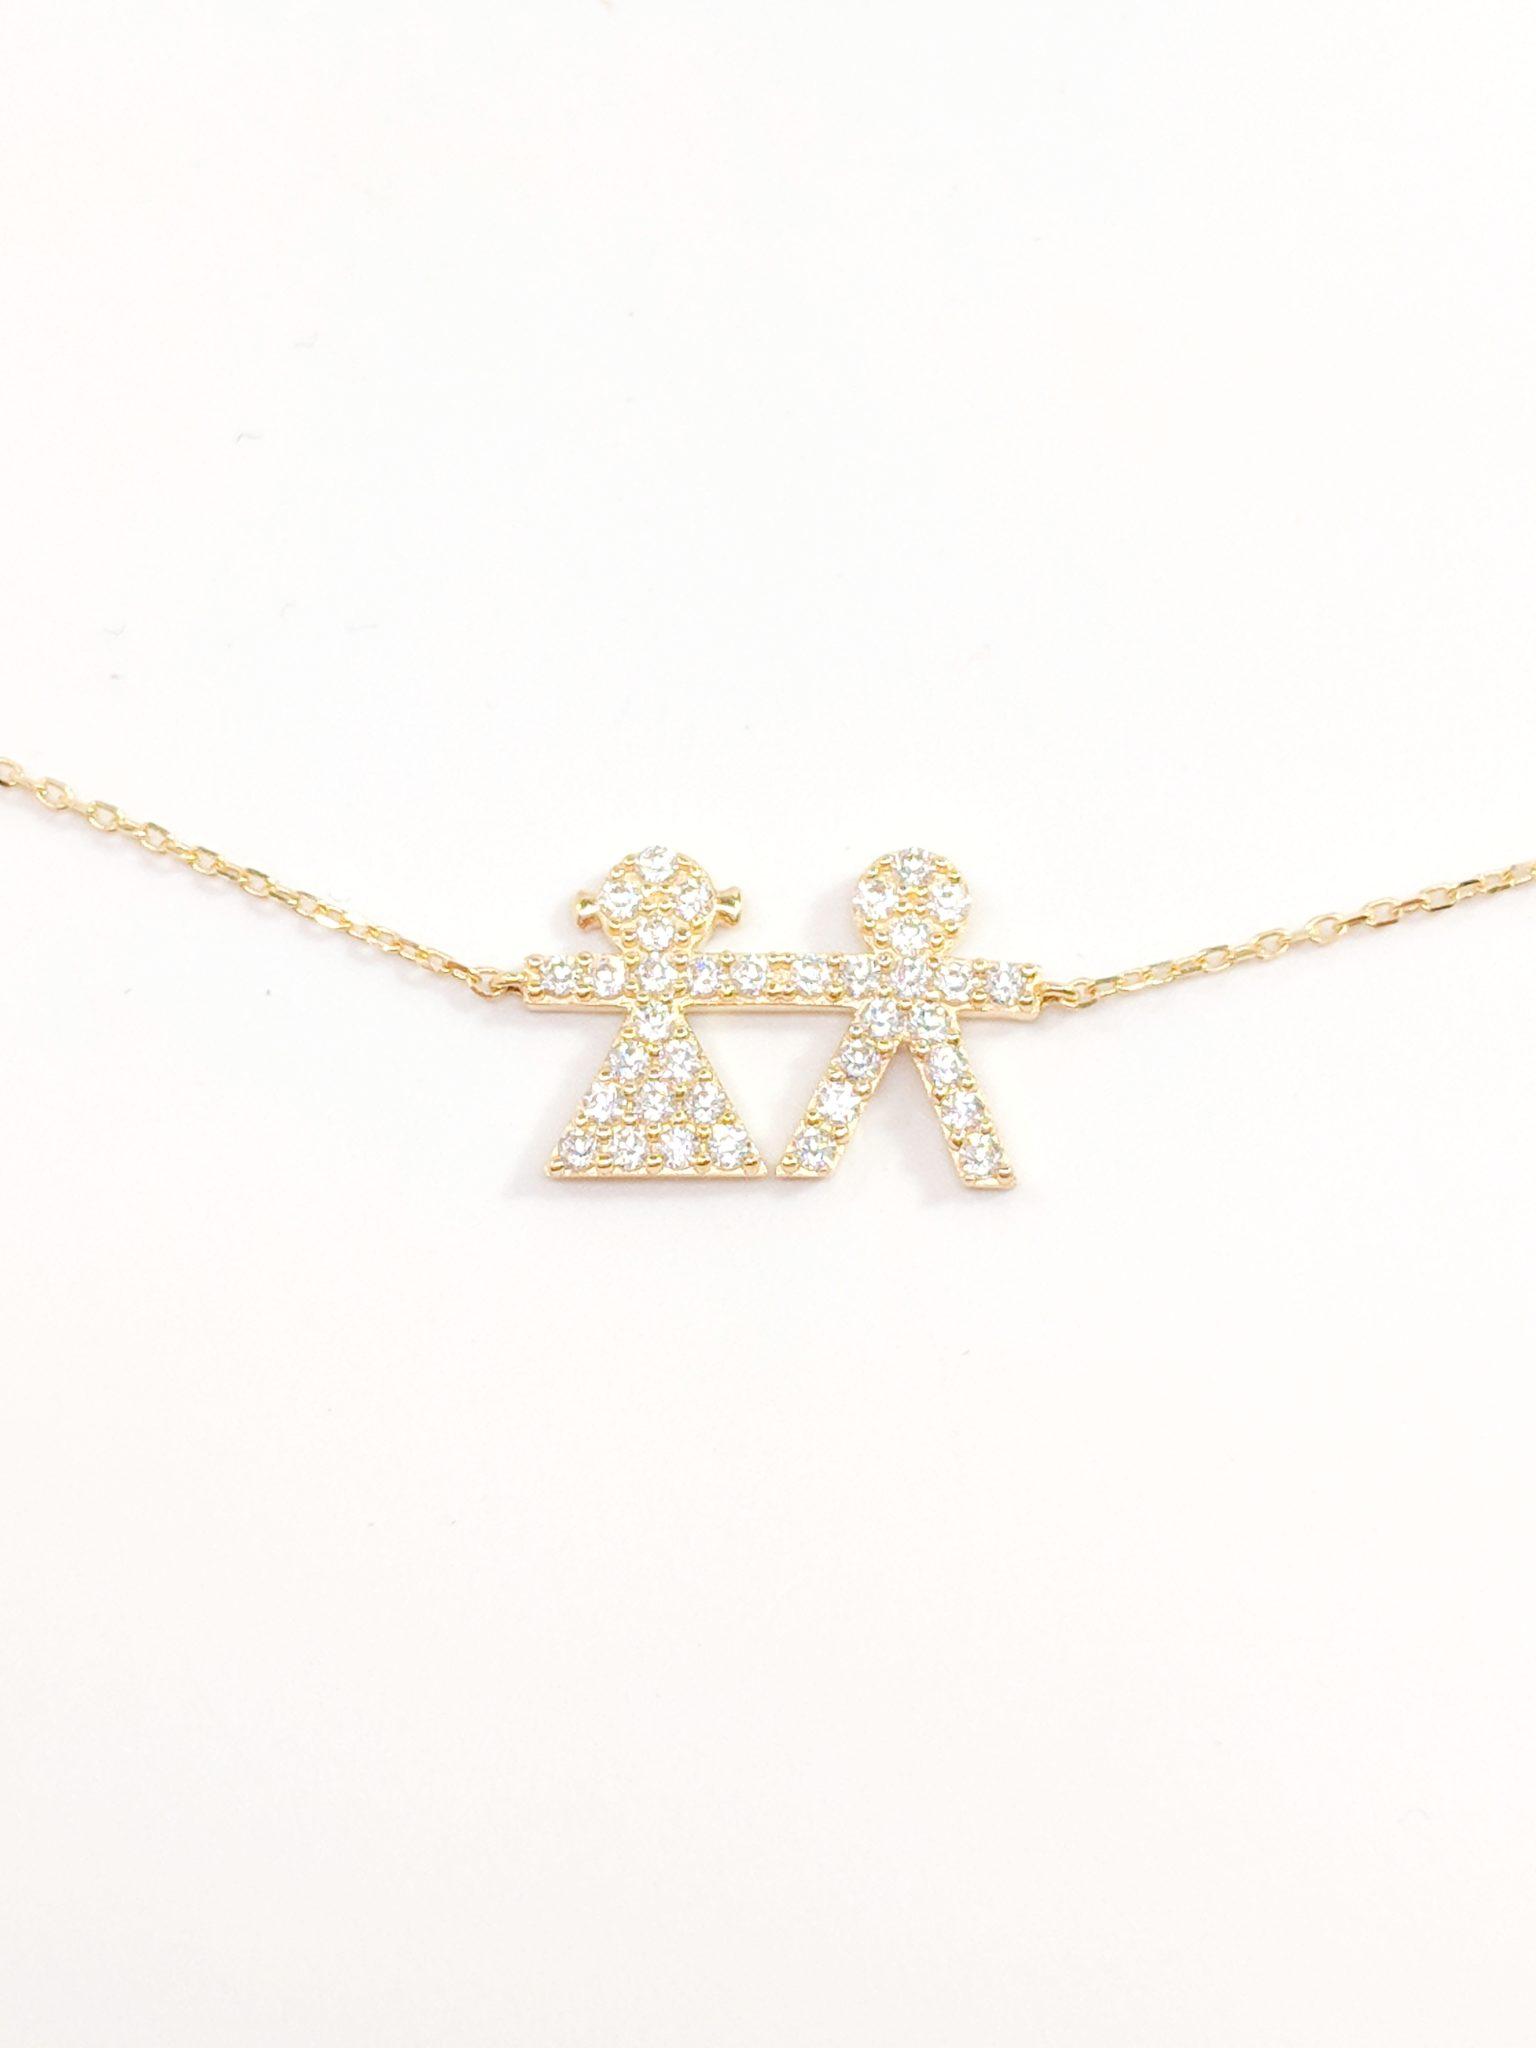 14K Yellow Gold Zirconia Boy & Girl Necklace